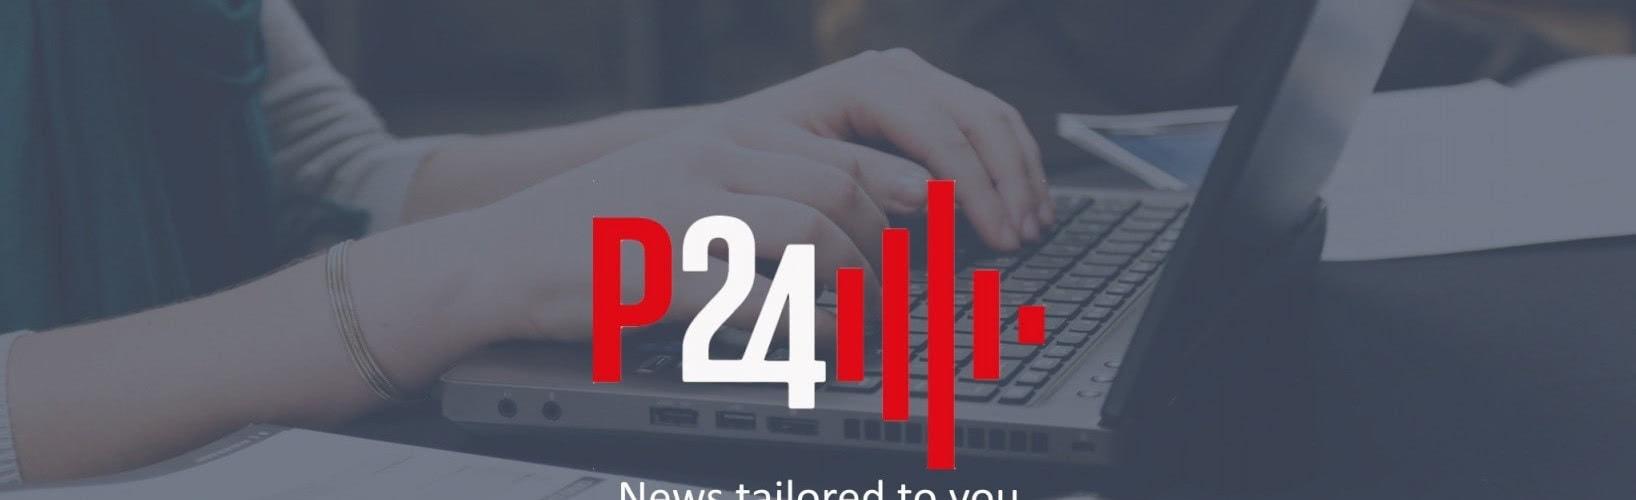 Jornal Público - P24